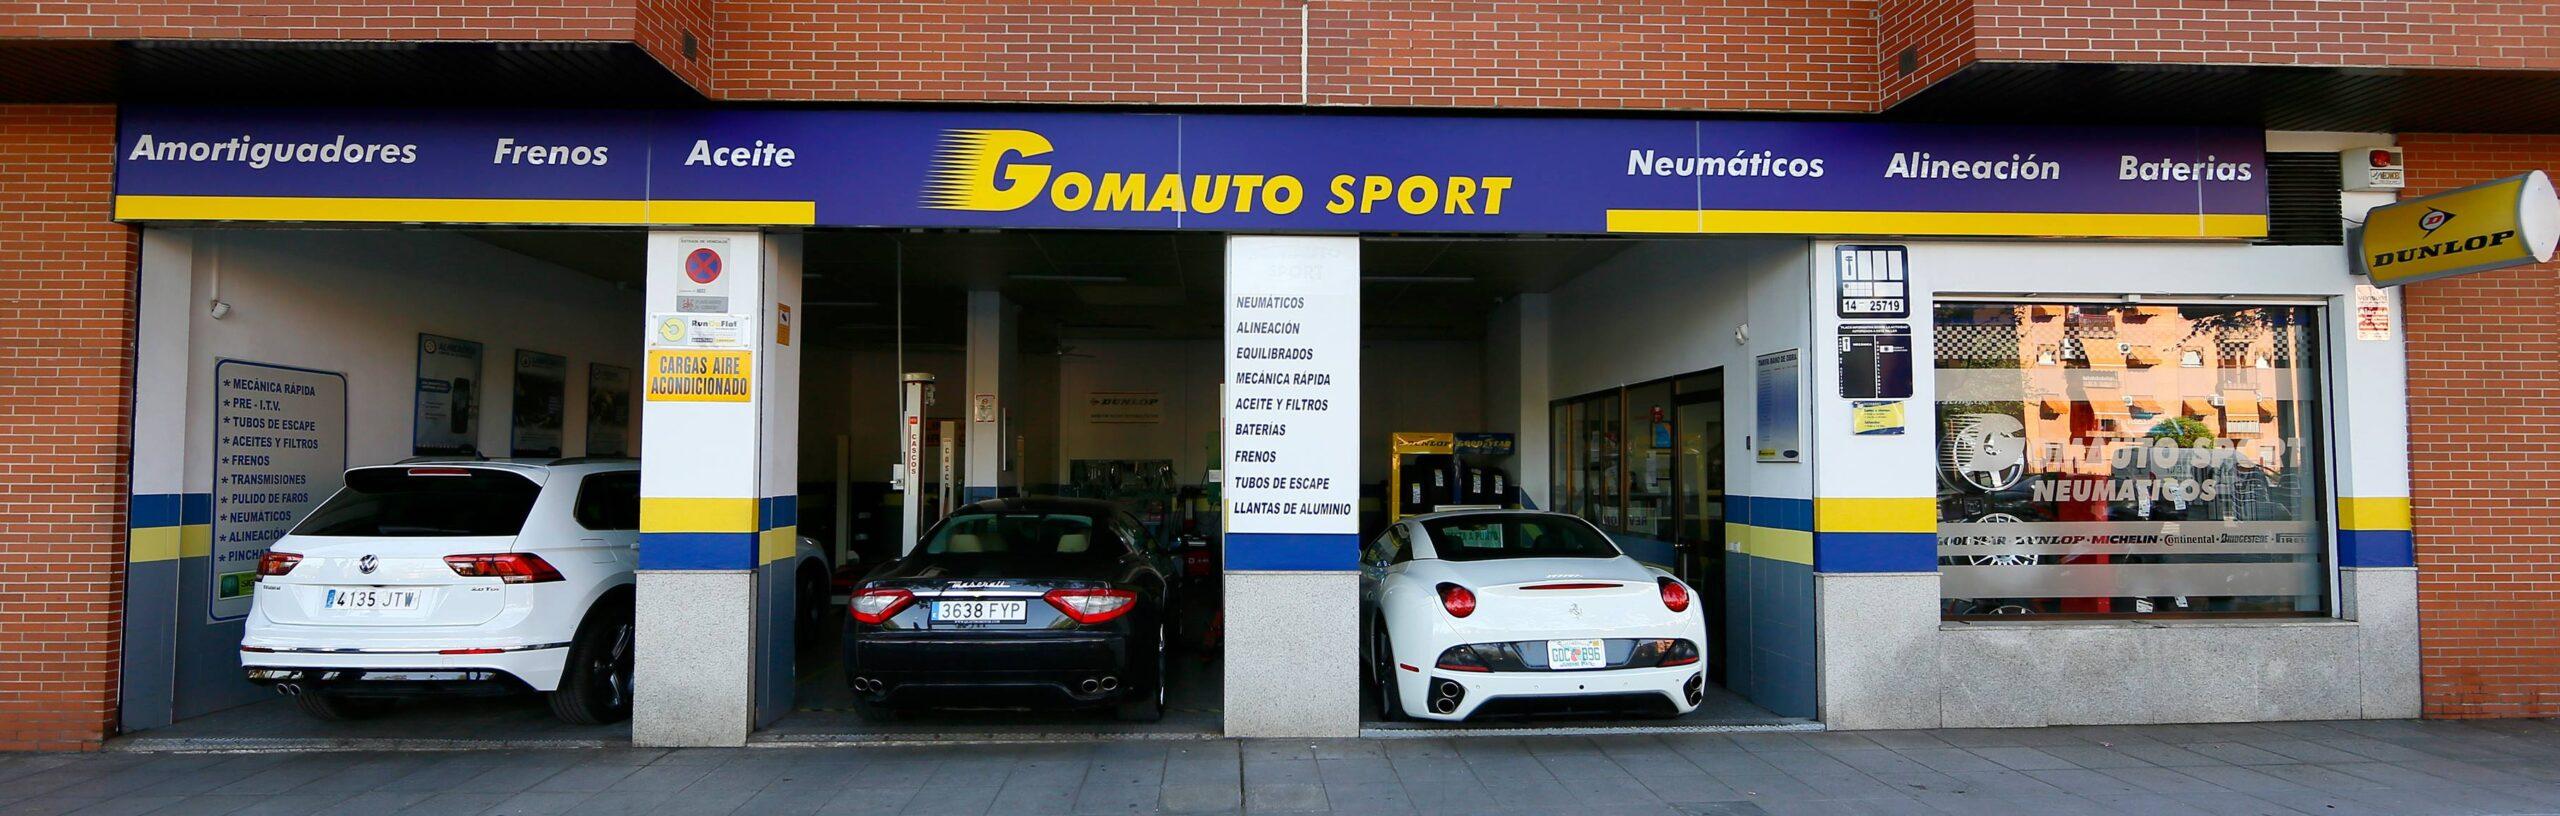 gomauto sport es tu taller de neumaticos en Córdoba capital